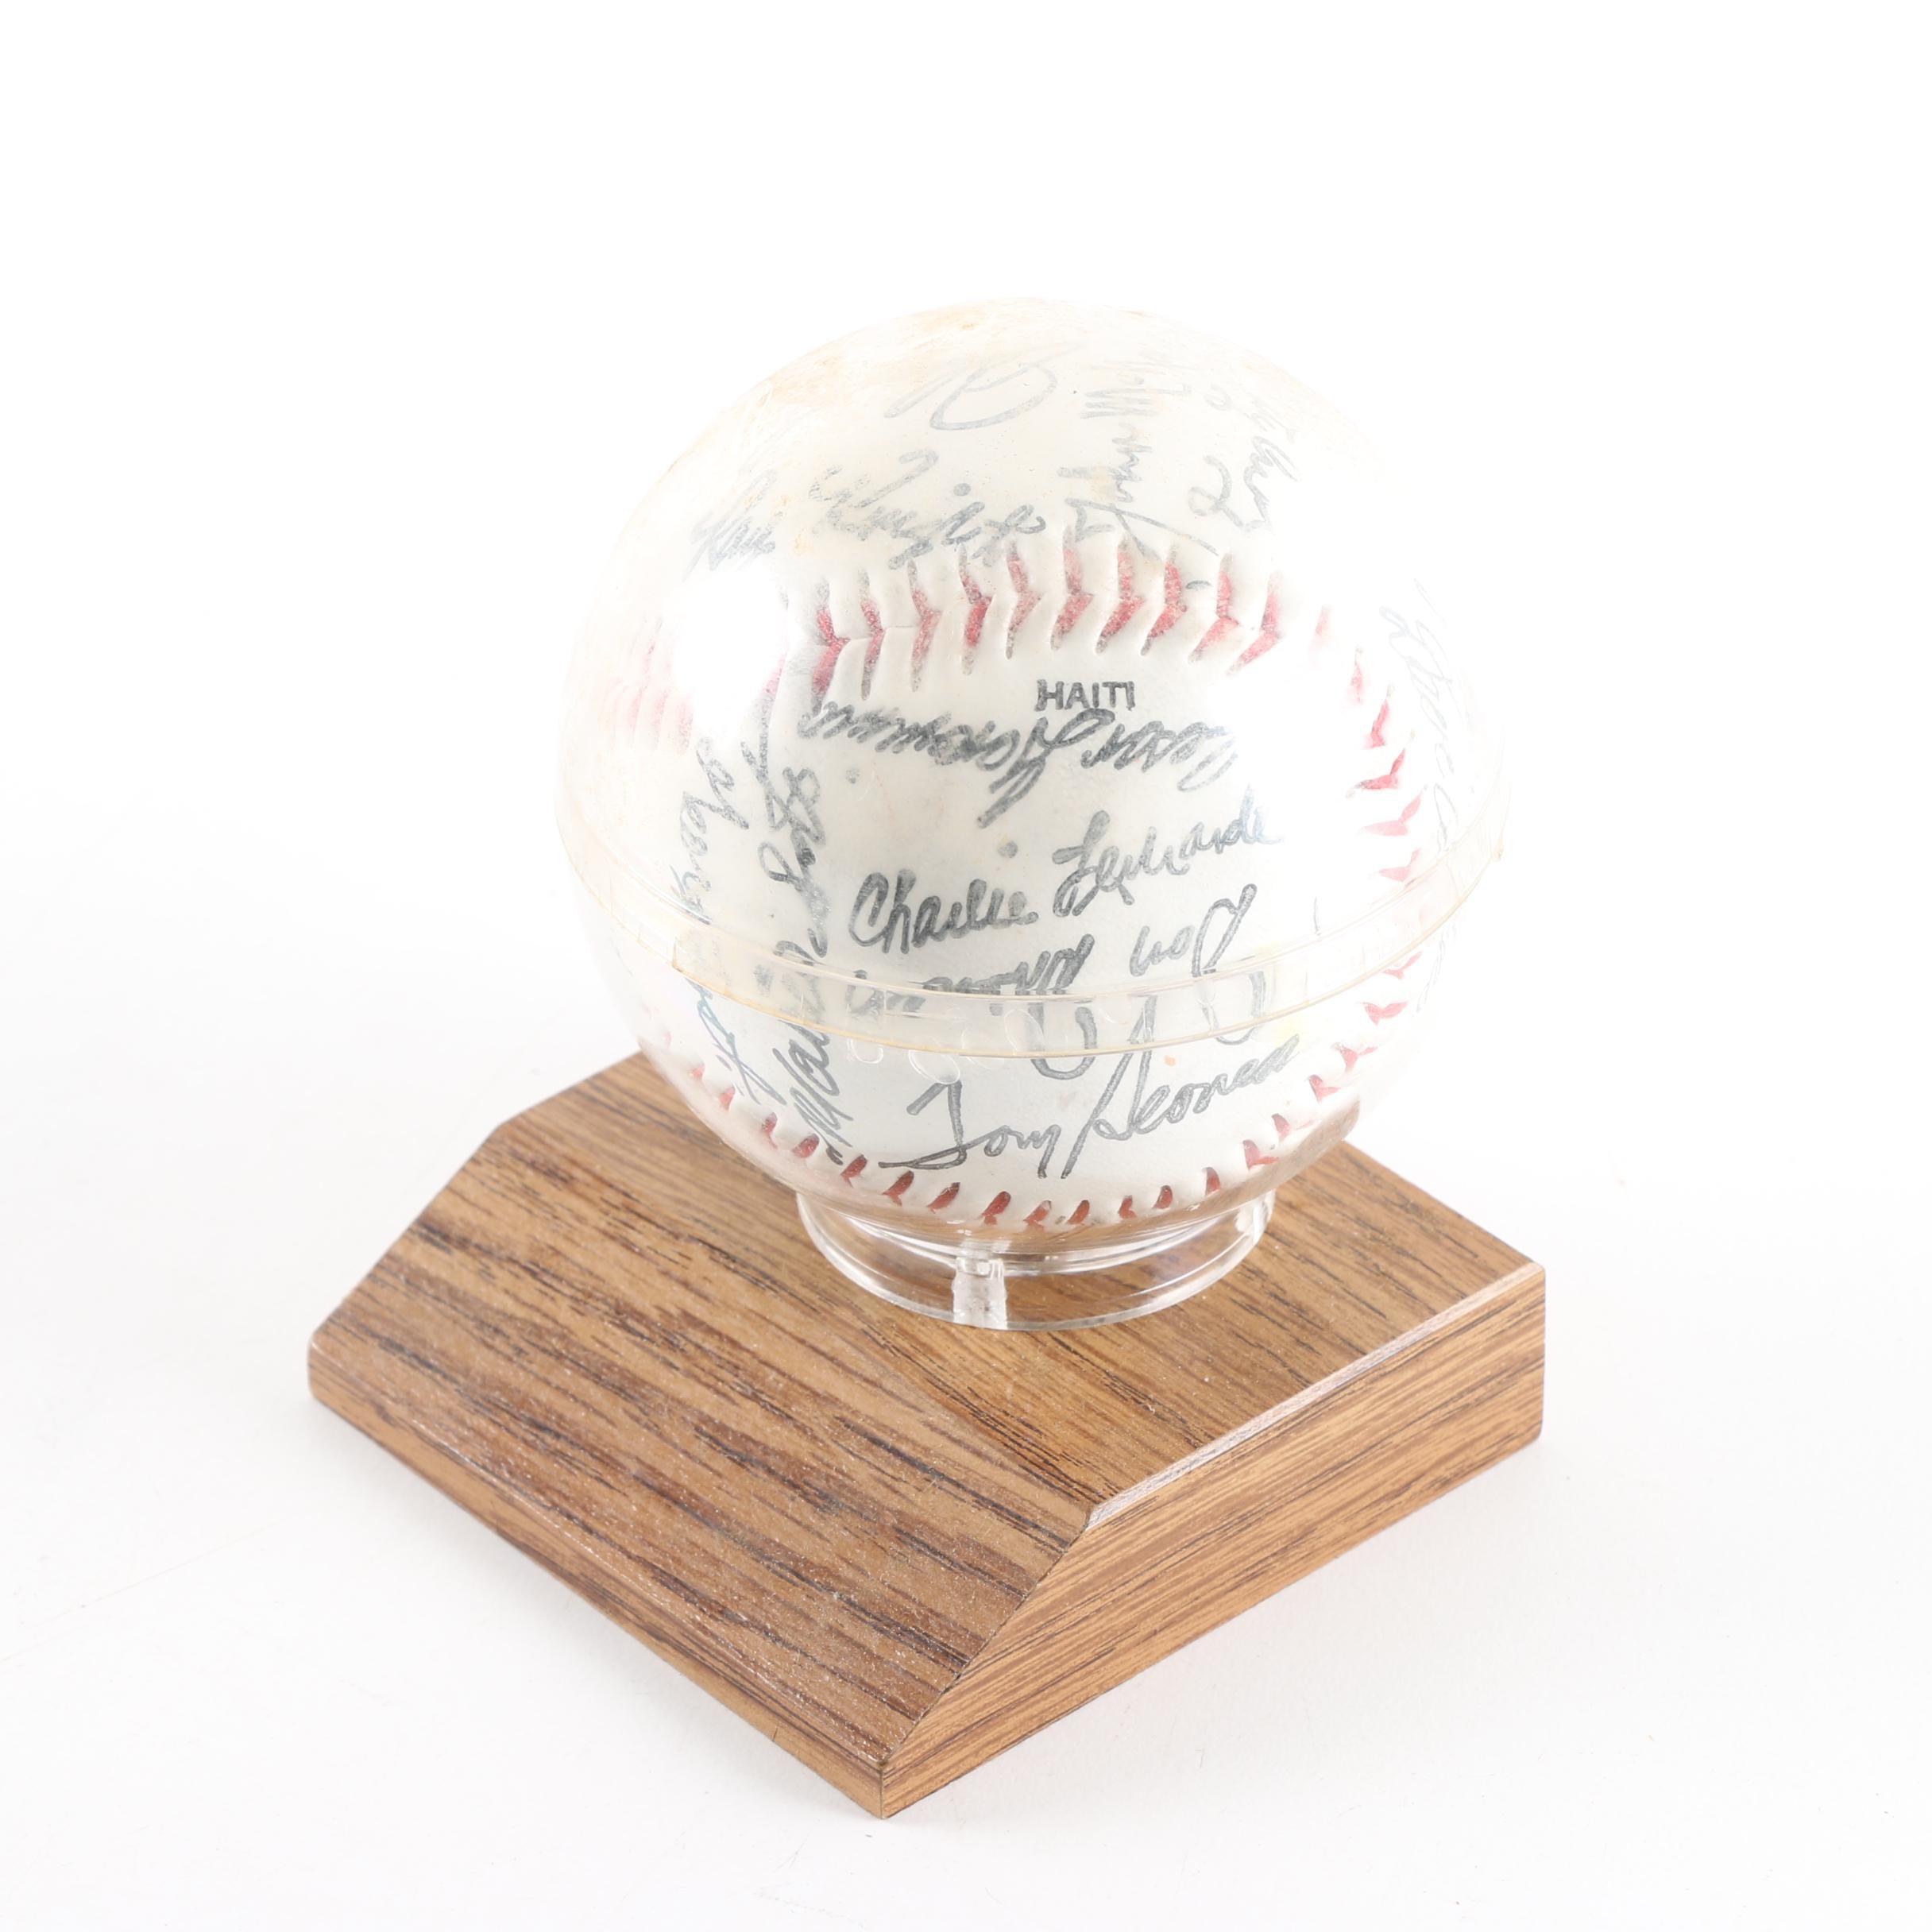 1979 Cincinnati Reds Team Signature Stamped Baseball